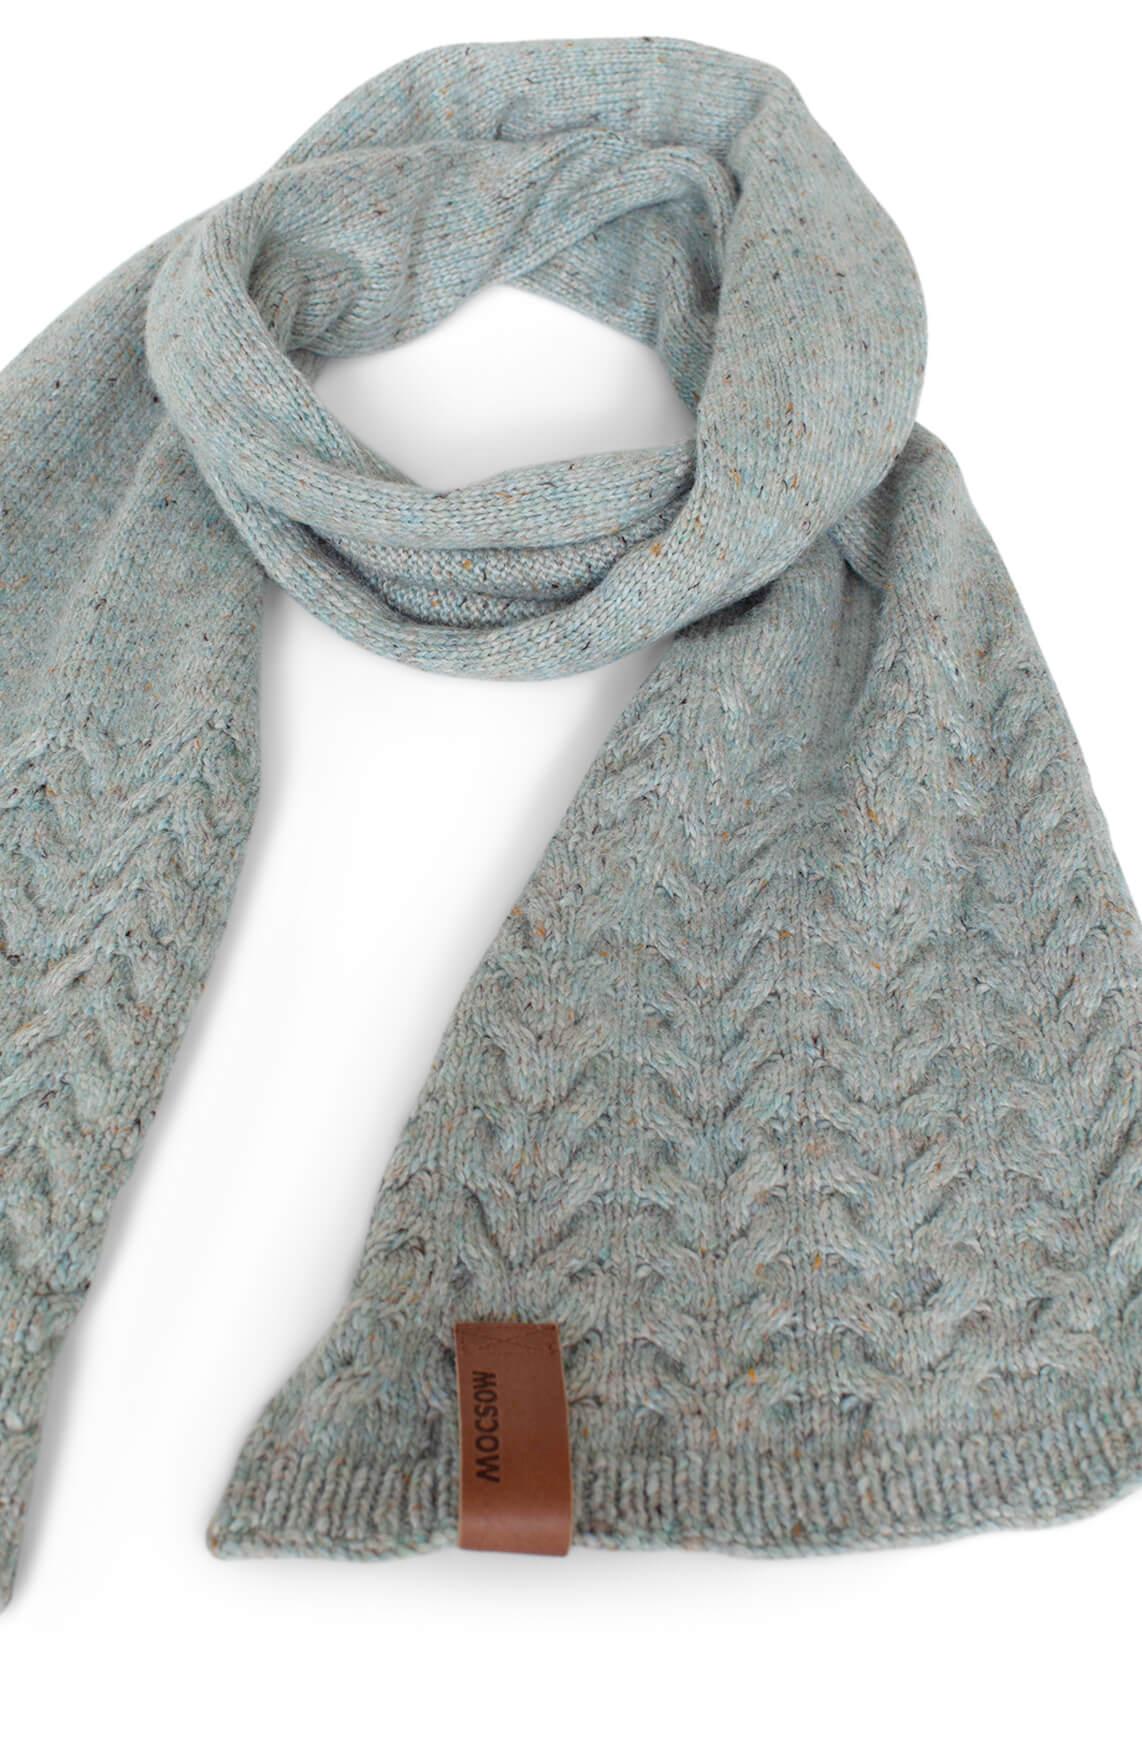 Moscow Dames Maryana scarf groen